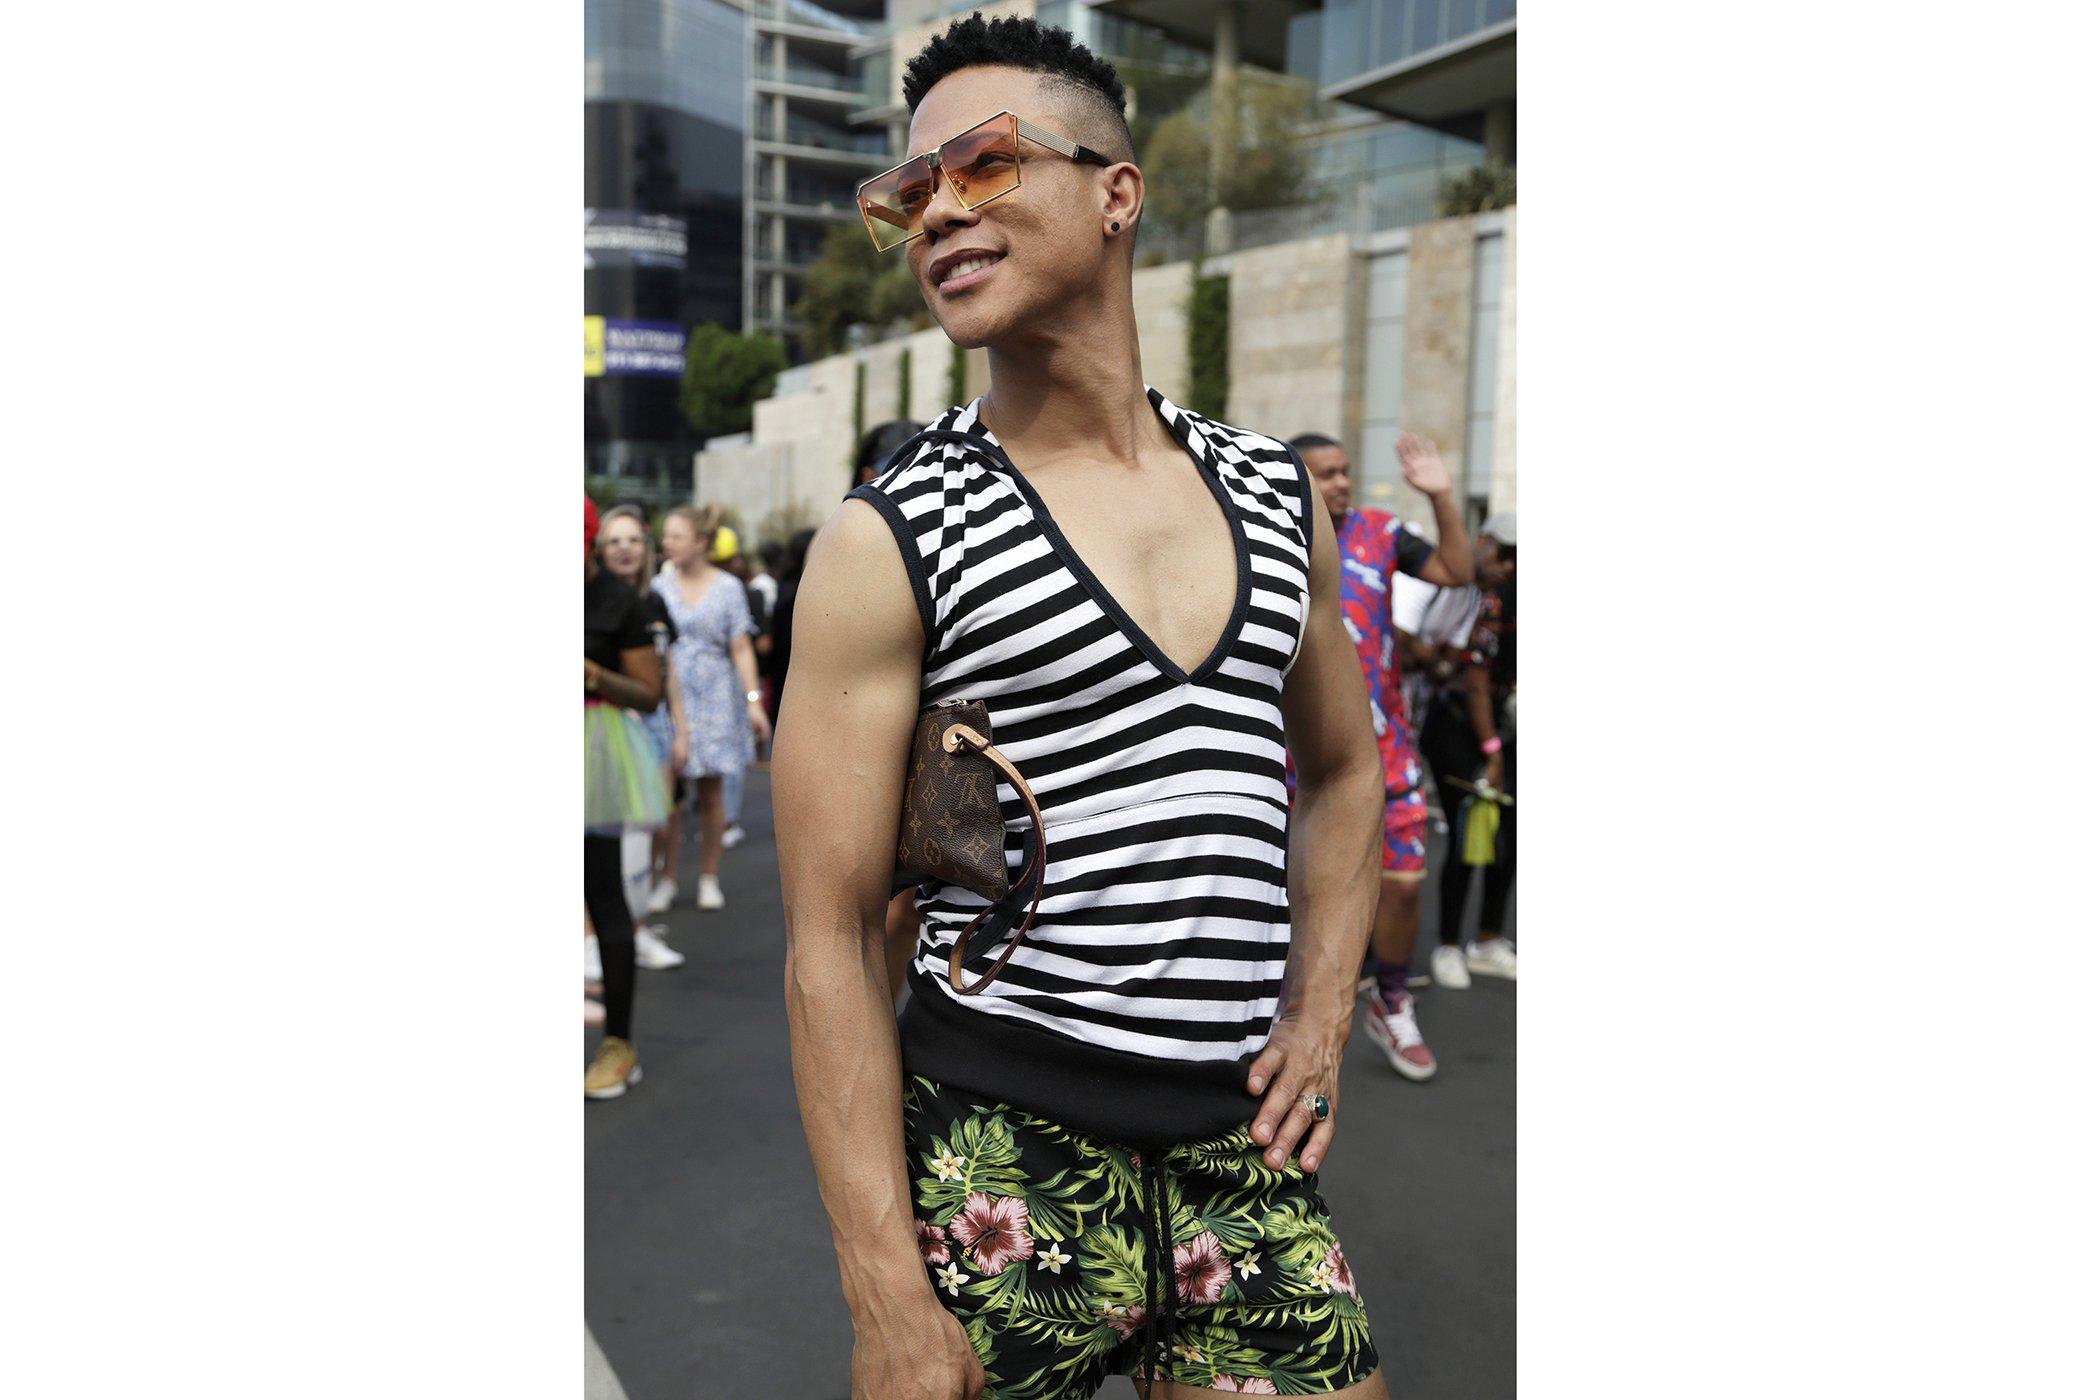 Johannesburg_Pride_LGBTQ_Noncedo Gxekwa_023-FULL.jpg